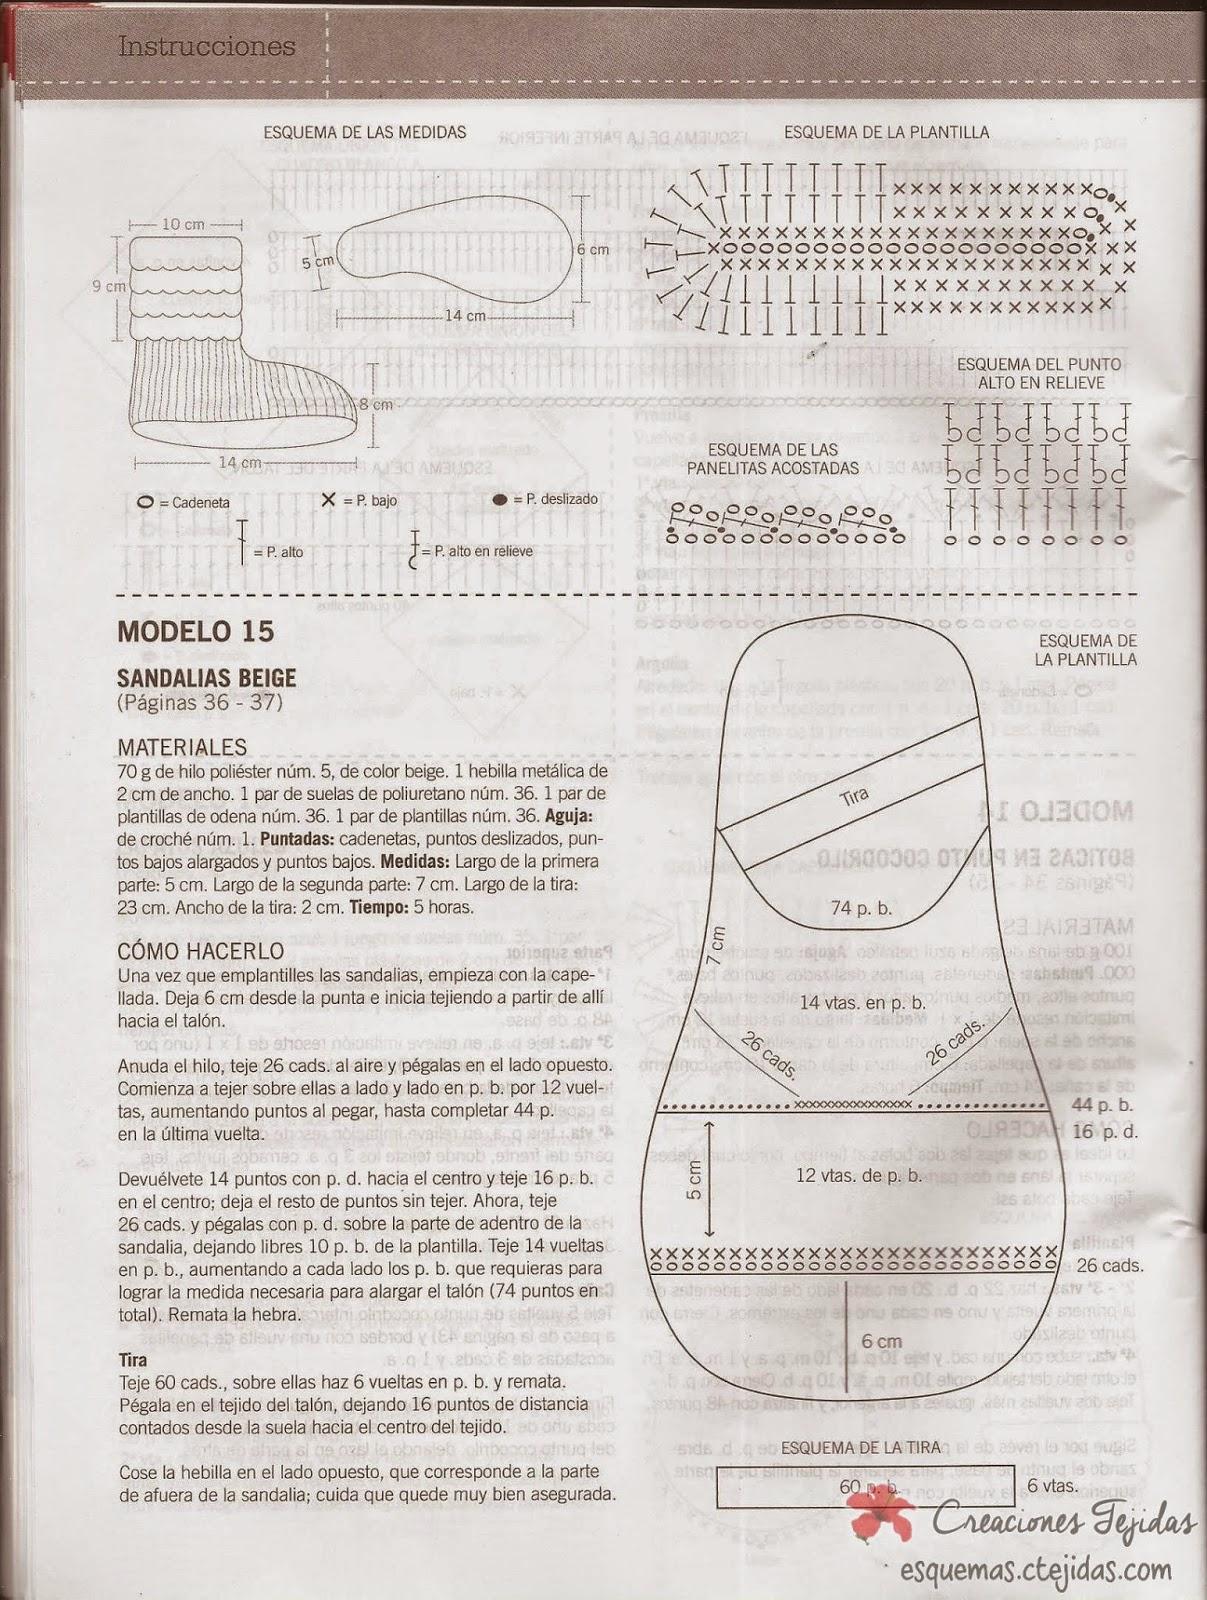 Zapatos a Crochet - Sandalias Beige